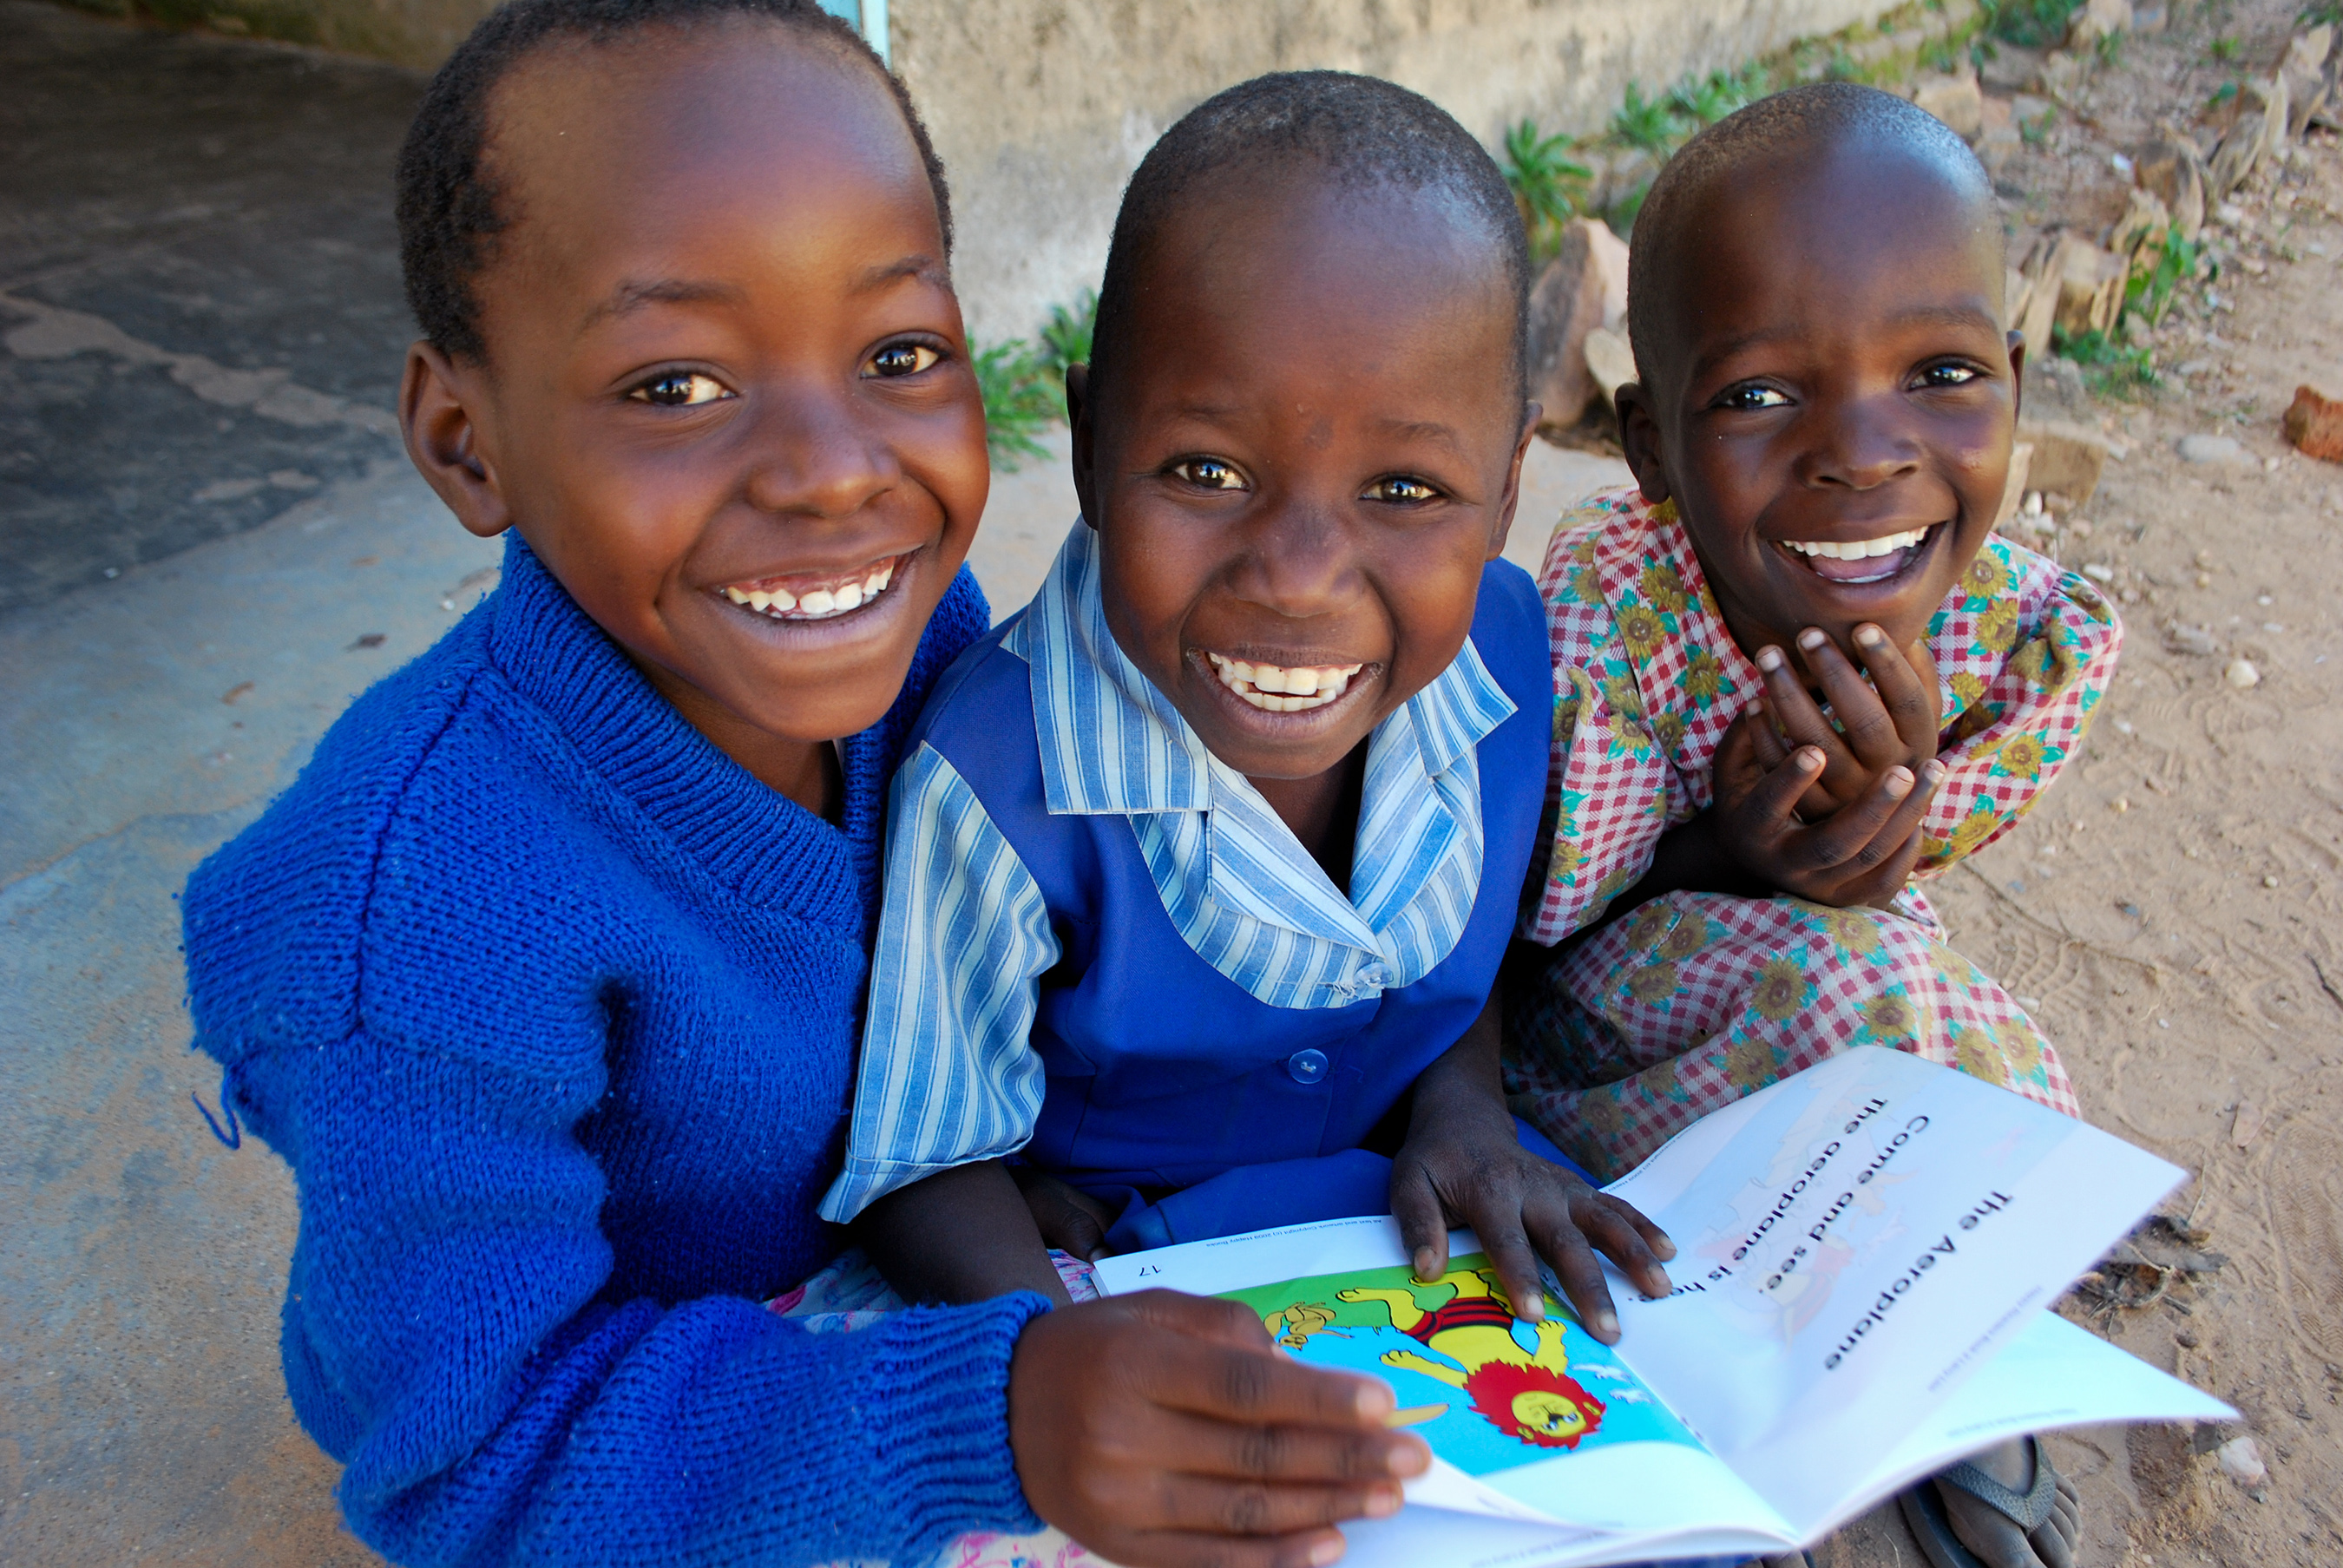 Picture Credit: Eileen Burke-Save the Children